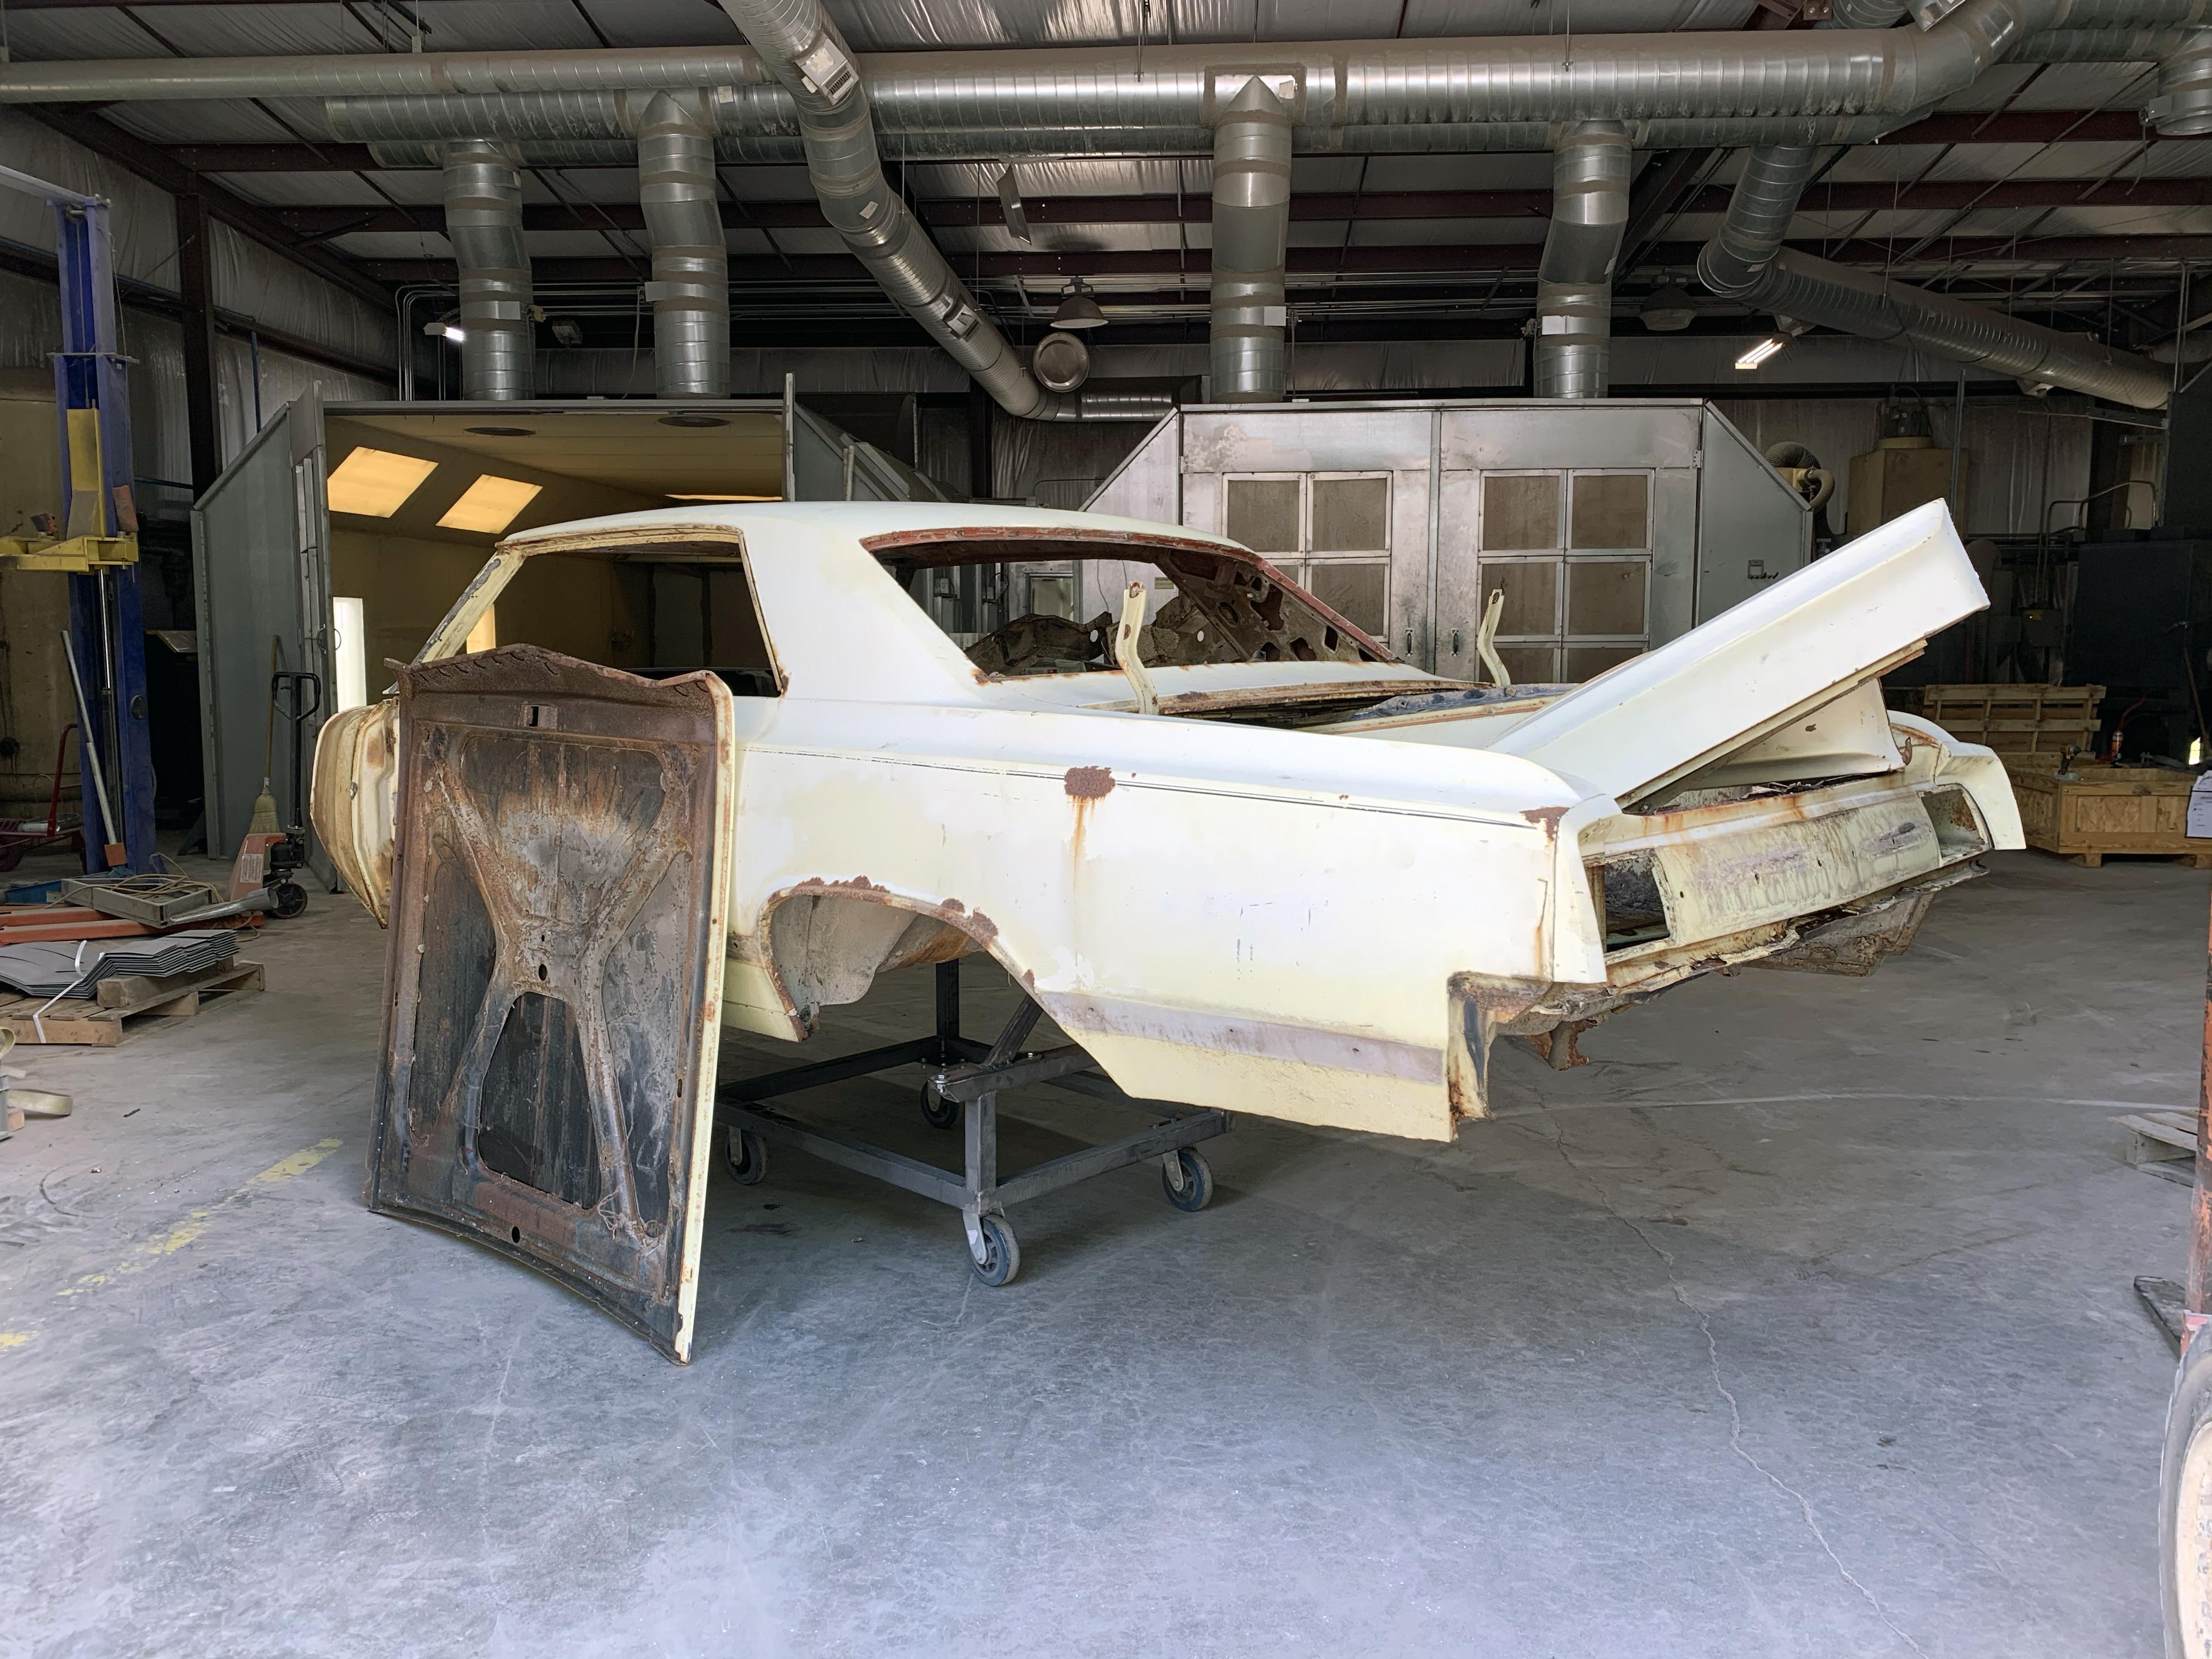 scotts-hotrods-65-cutlass-project-21